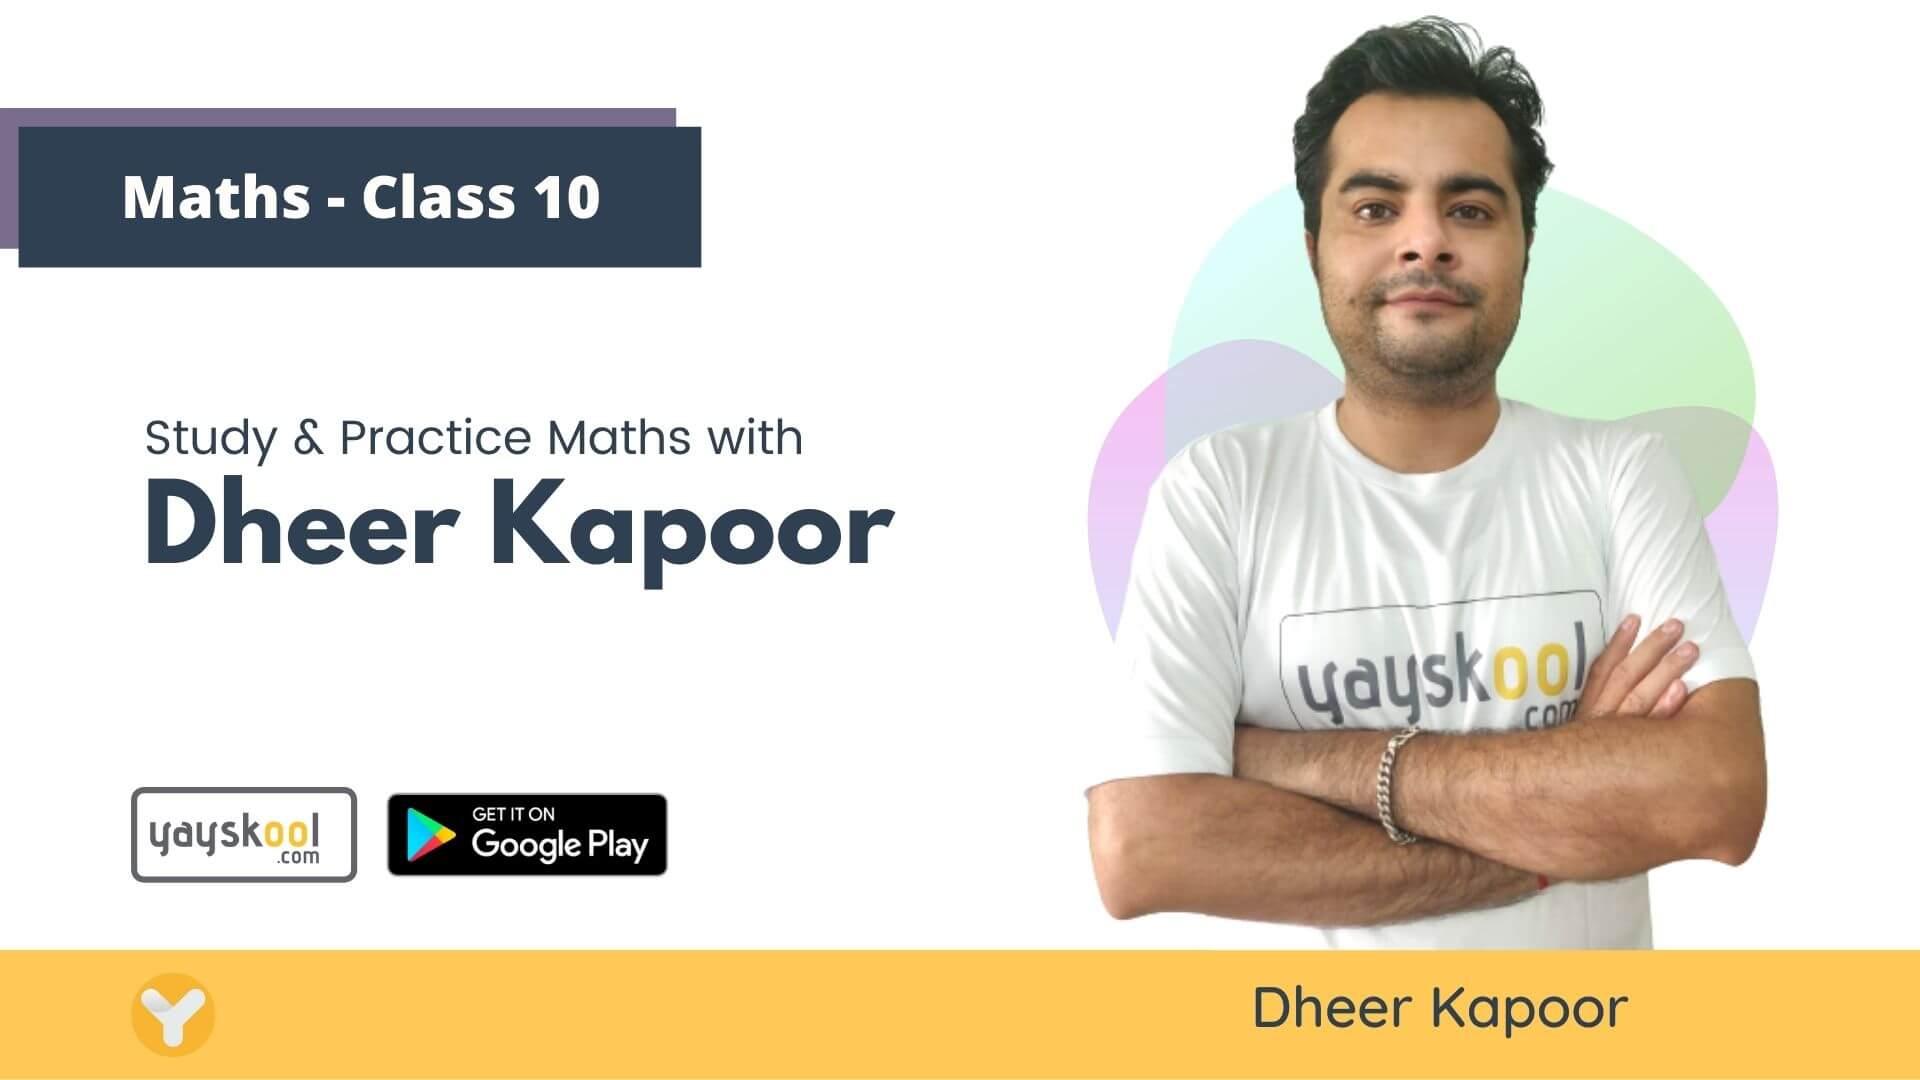 math-course-class10-dheer-kapoor